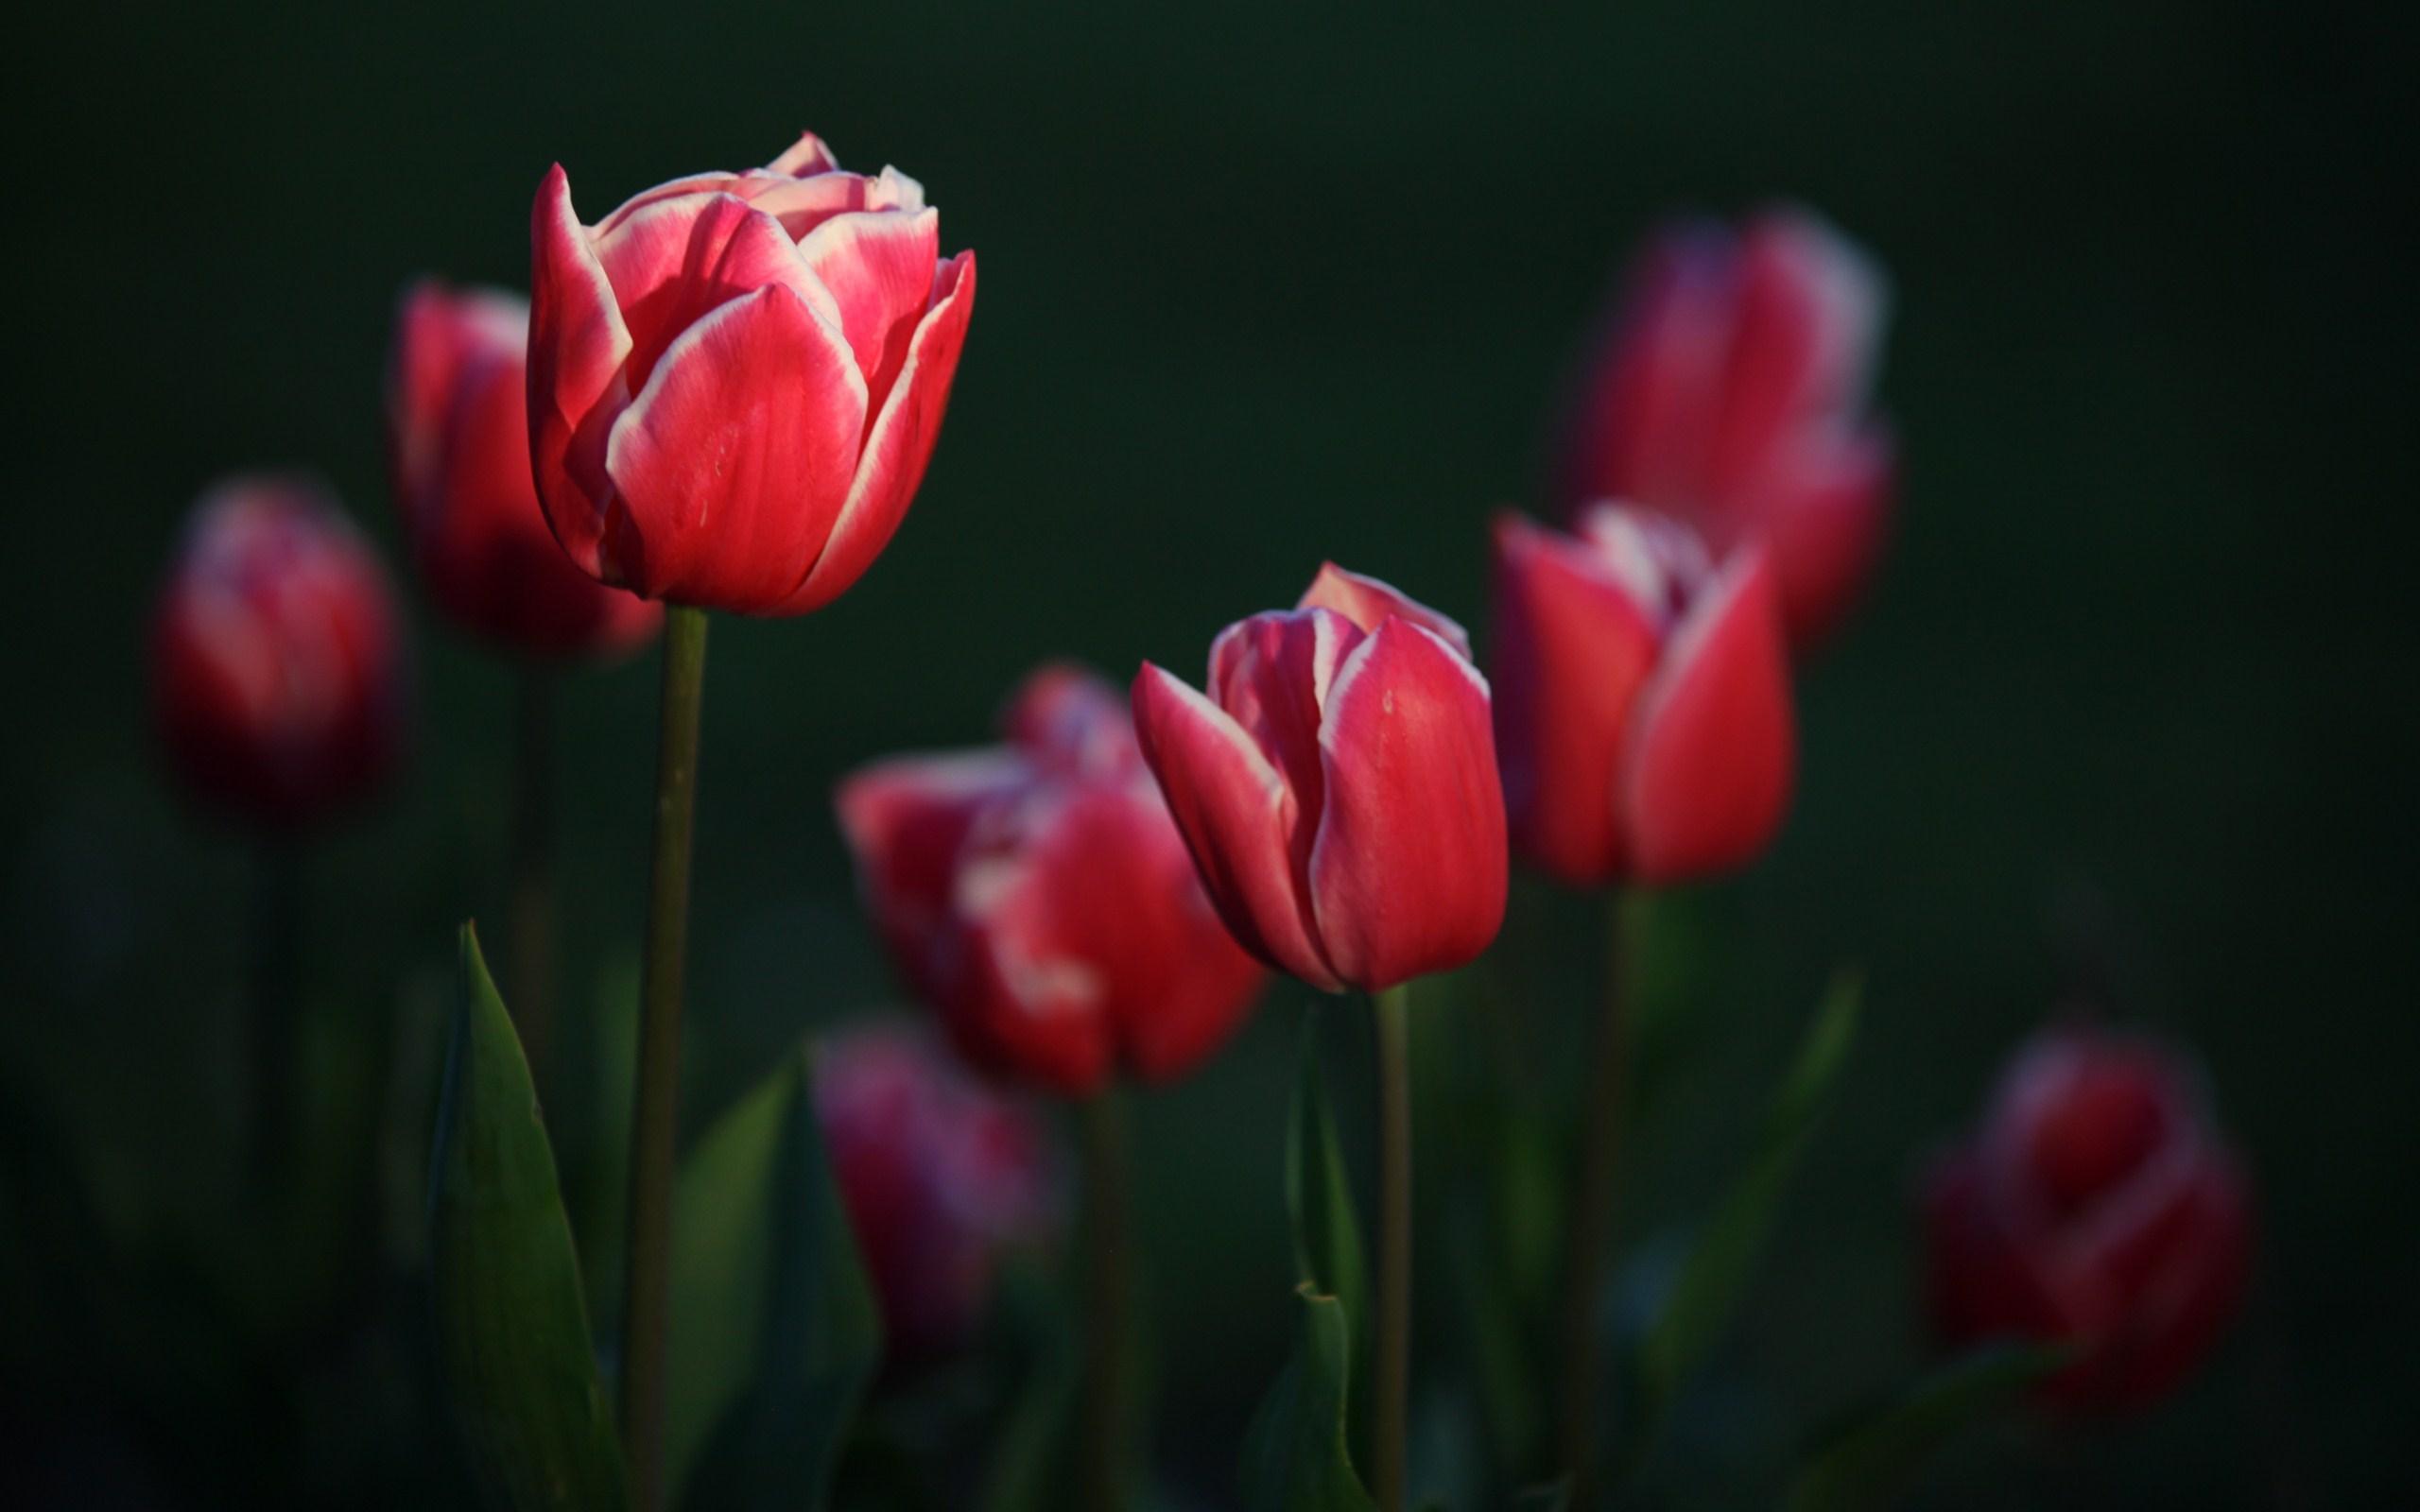 Garden Flowers Tulips Photo Hd Desktop Wallpapers 4k Hd